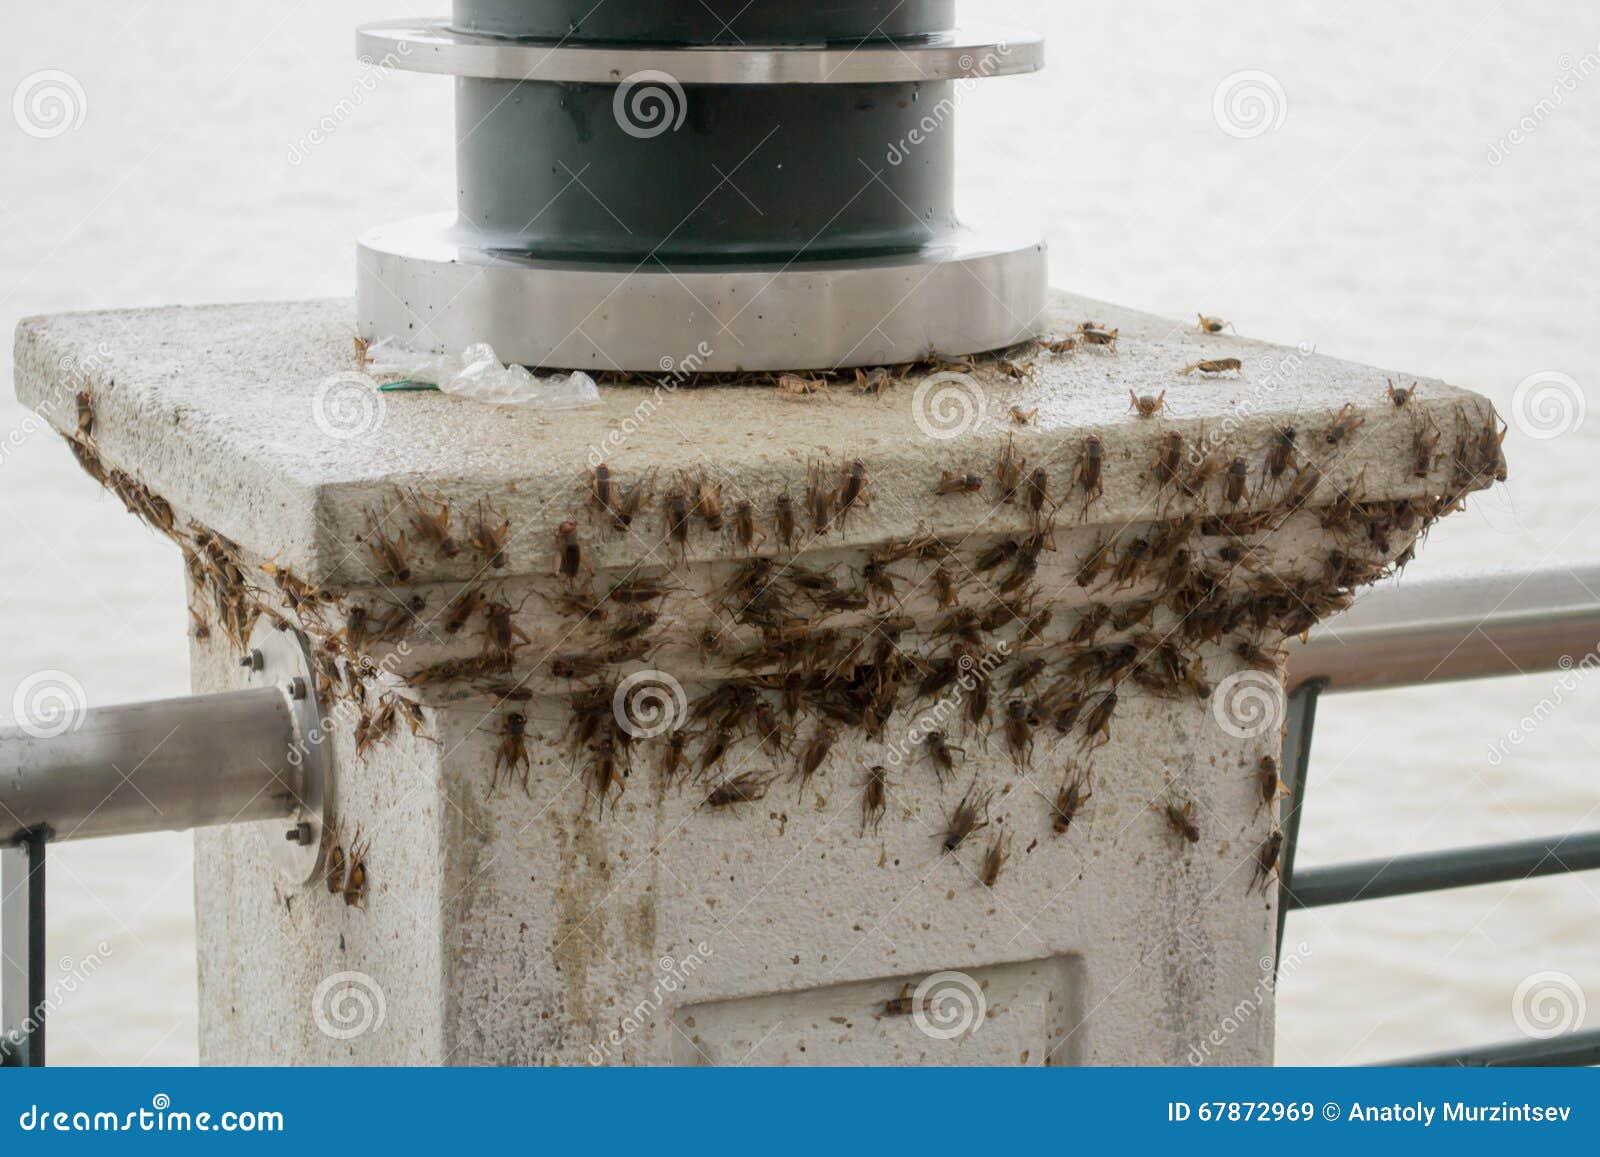 A huge load of crickets (acheta domesticus)